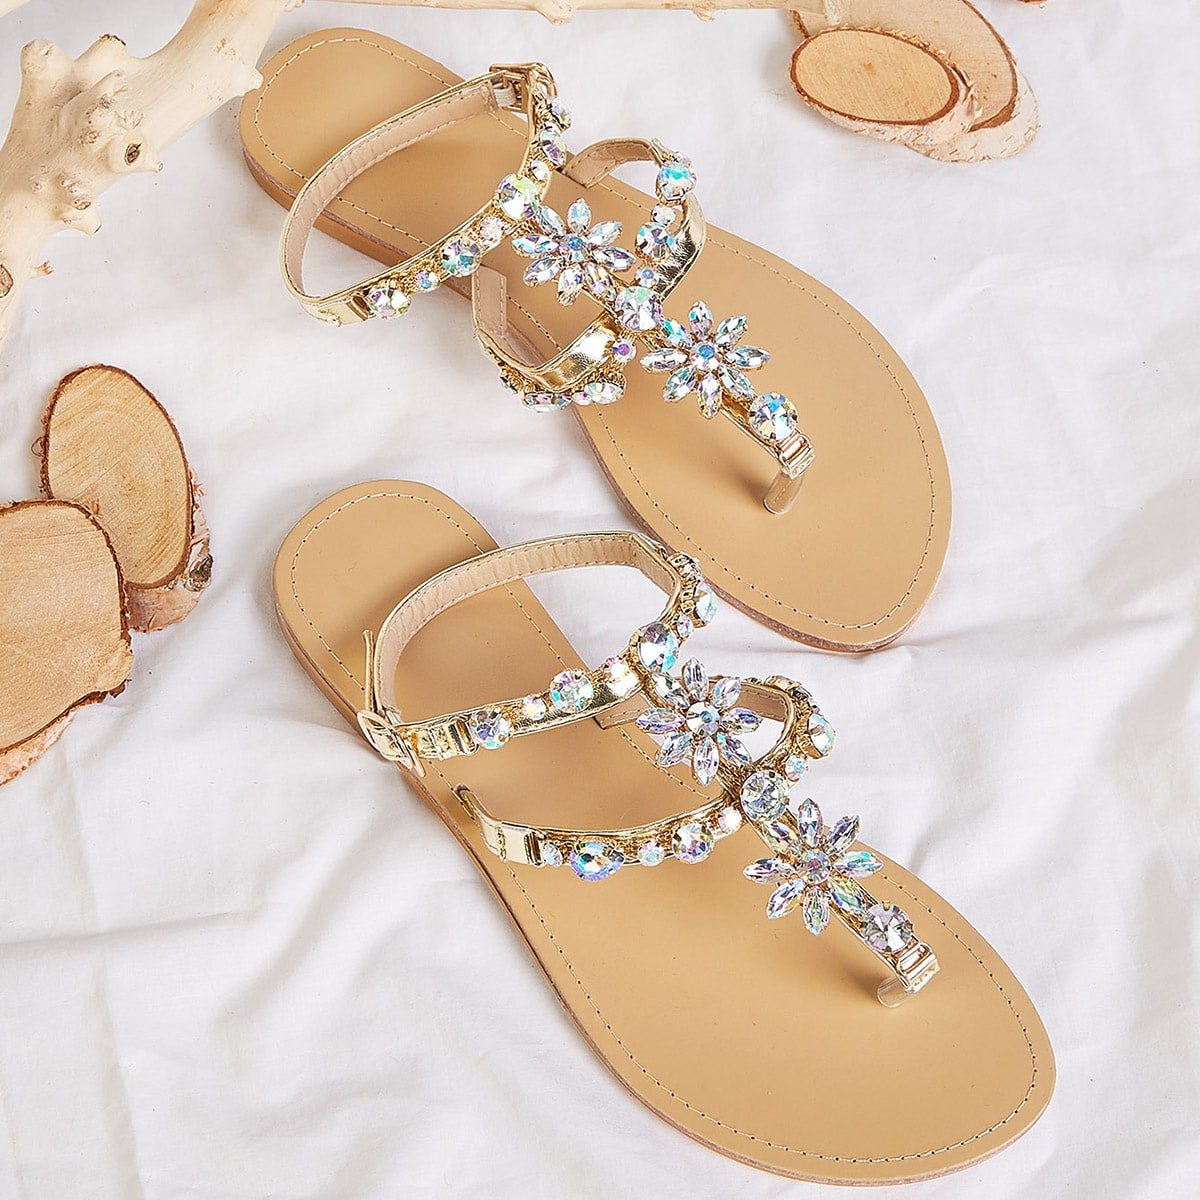 SHEIN / Sandalias chancletas con diseño de joya